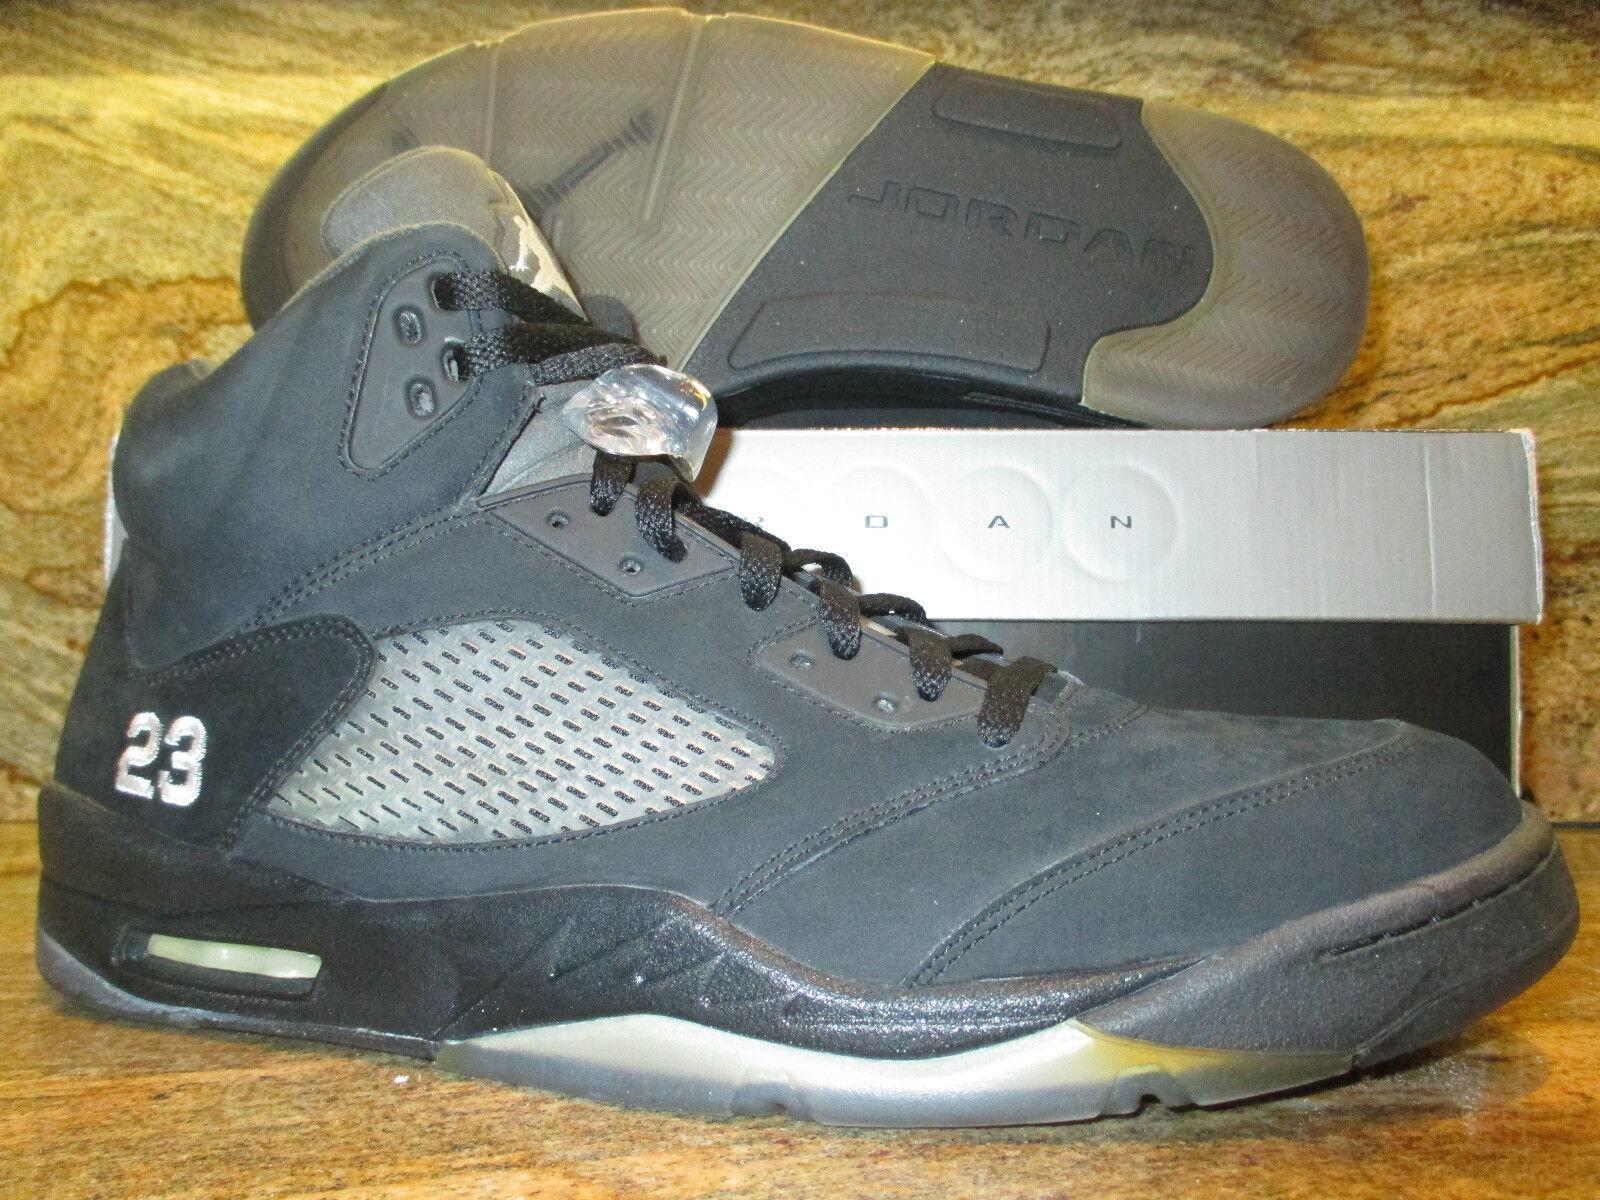 Nike Air Jordan 5 V Retro SZ 14 Wear Test Promo Sample Blackout Tokyo Black Ice